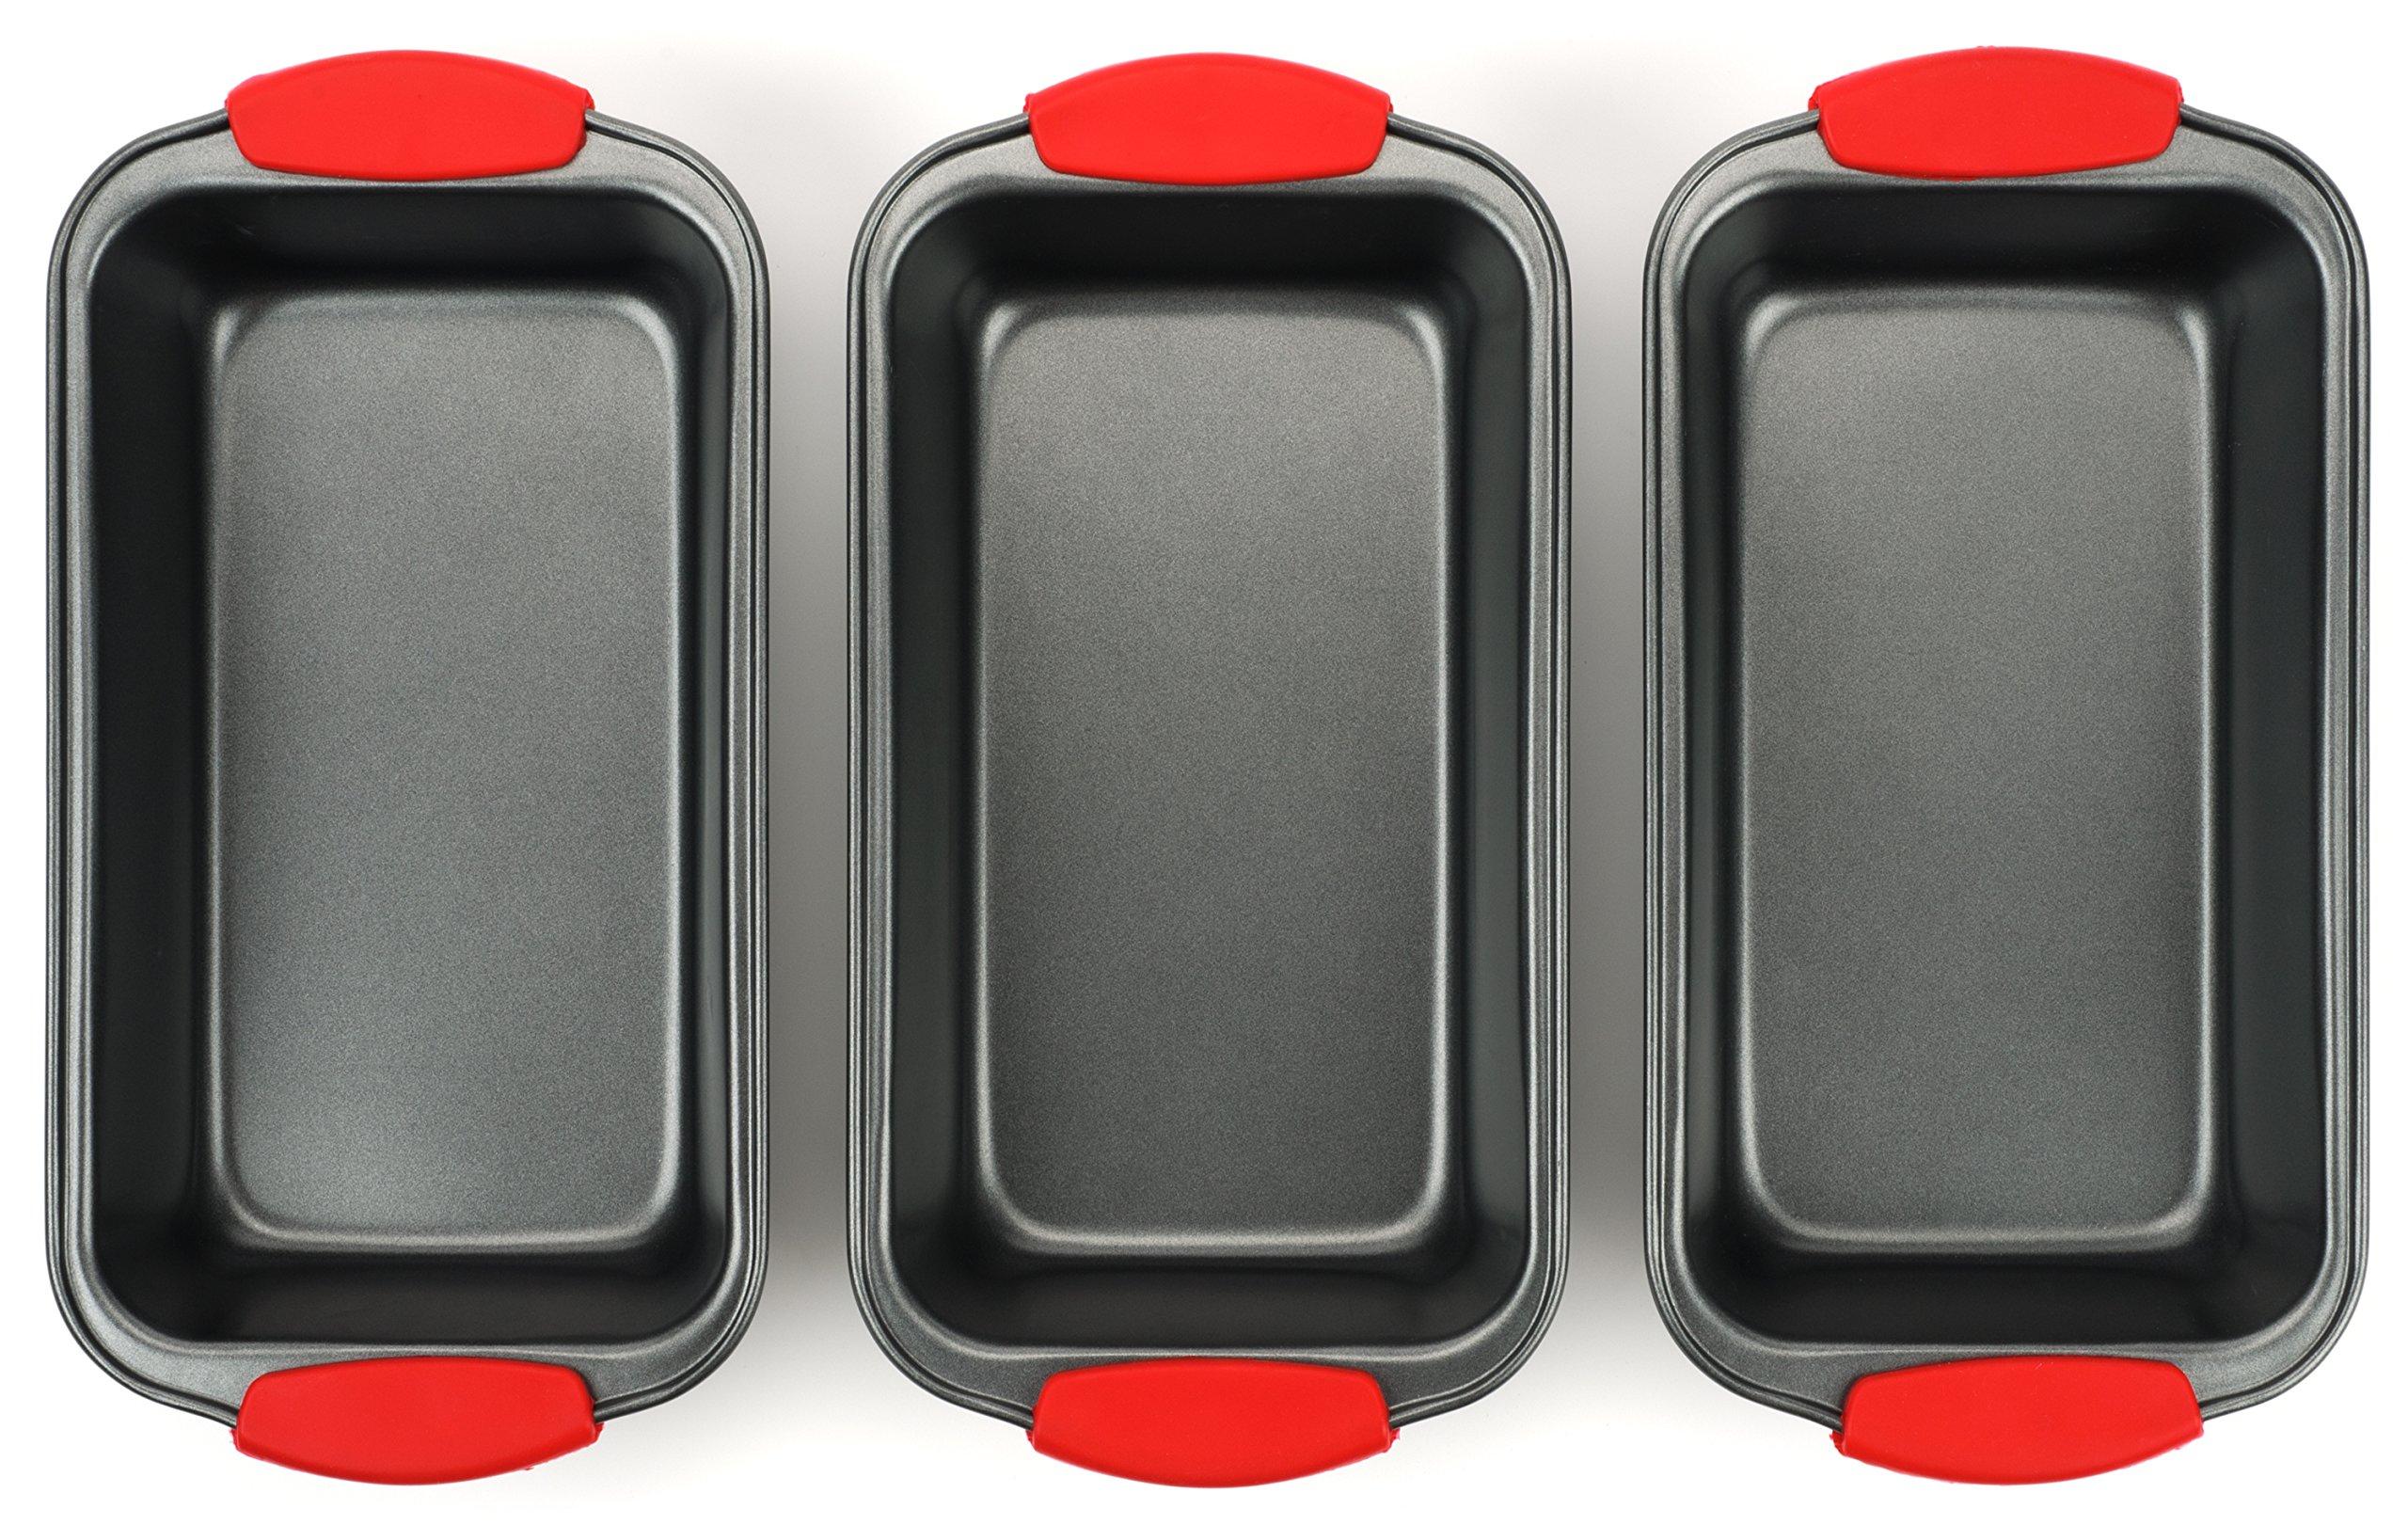 Elite Bakeware 3 Piece NonStick Bread Pan Set - Loaf Pans For Bread - Baking Pans - Bakeware Set by Elite Bakeware (Image #5)